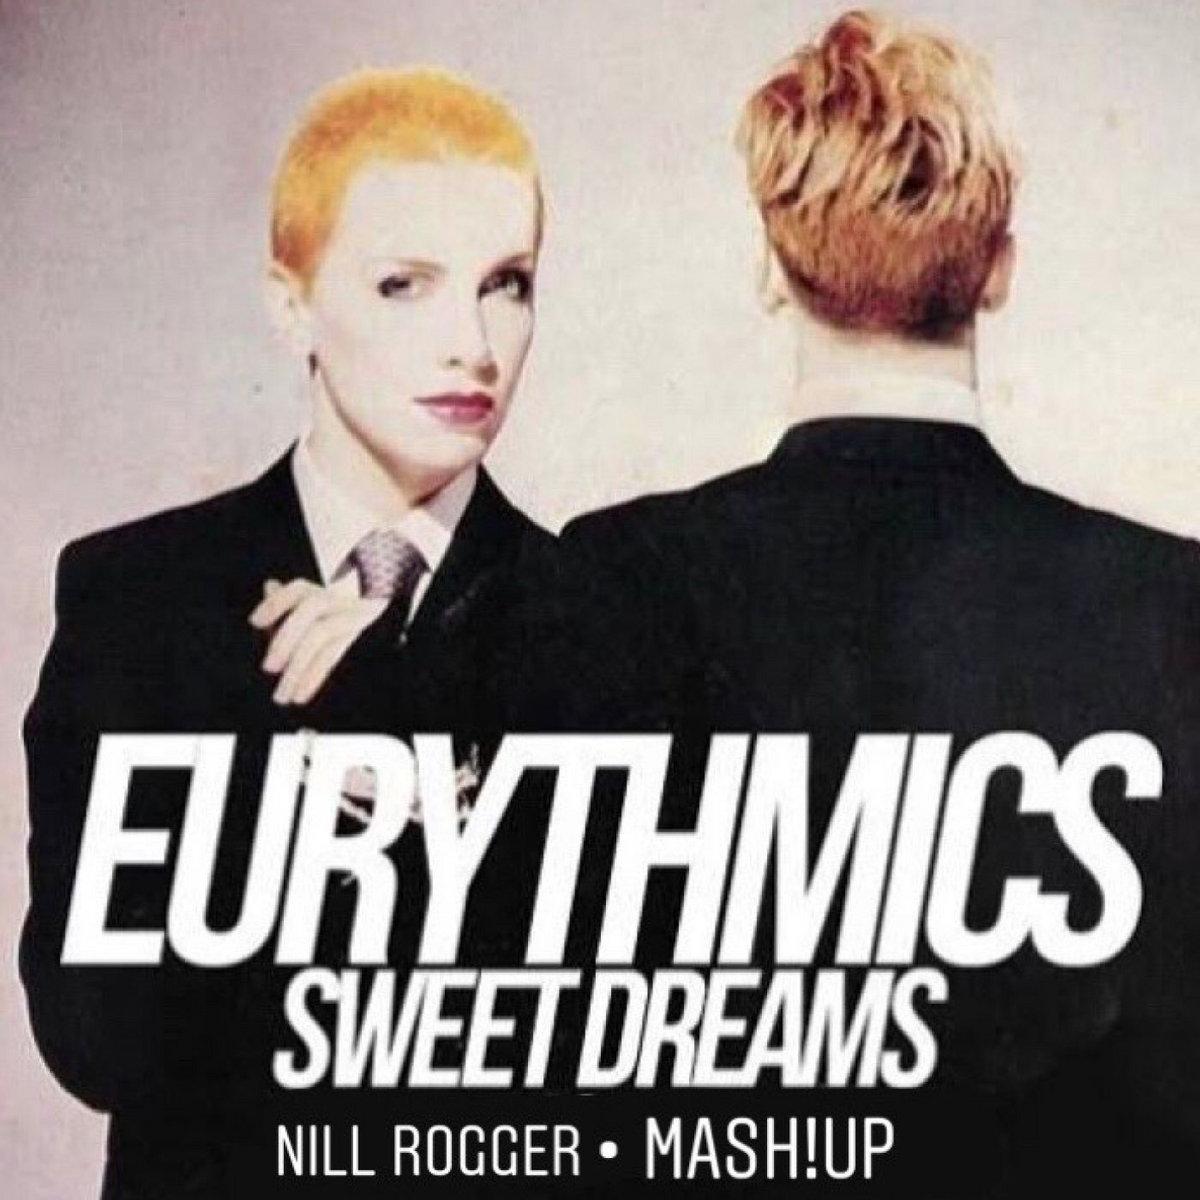 eurythmics sweet dreams mp3 free download